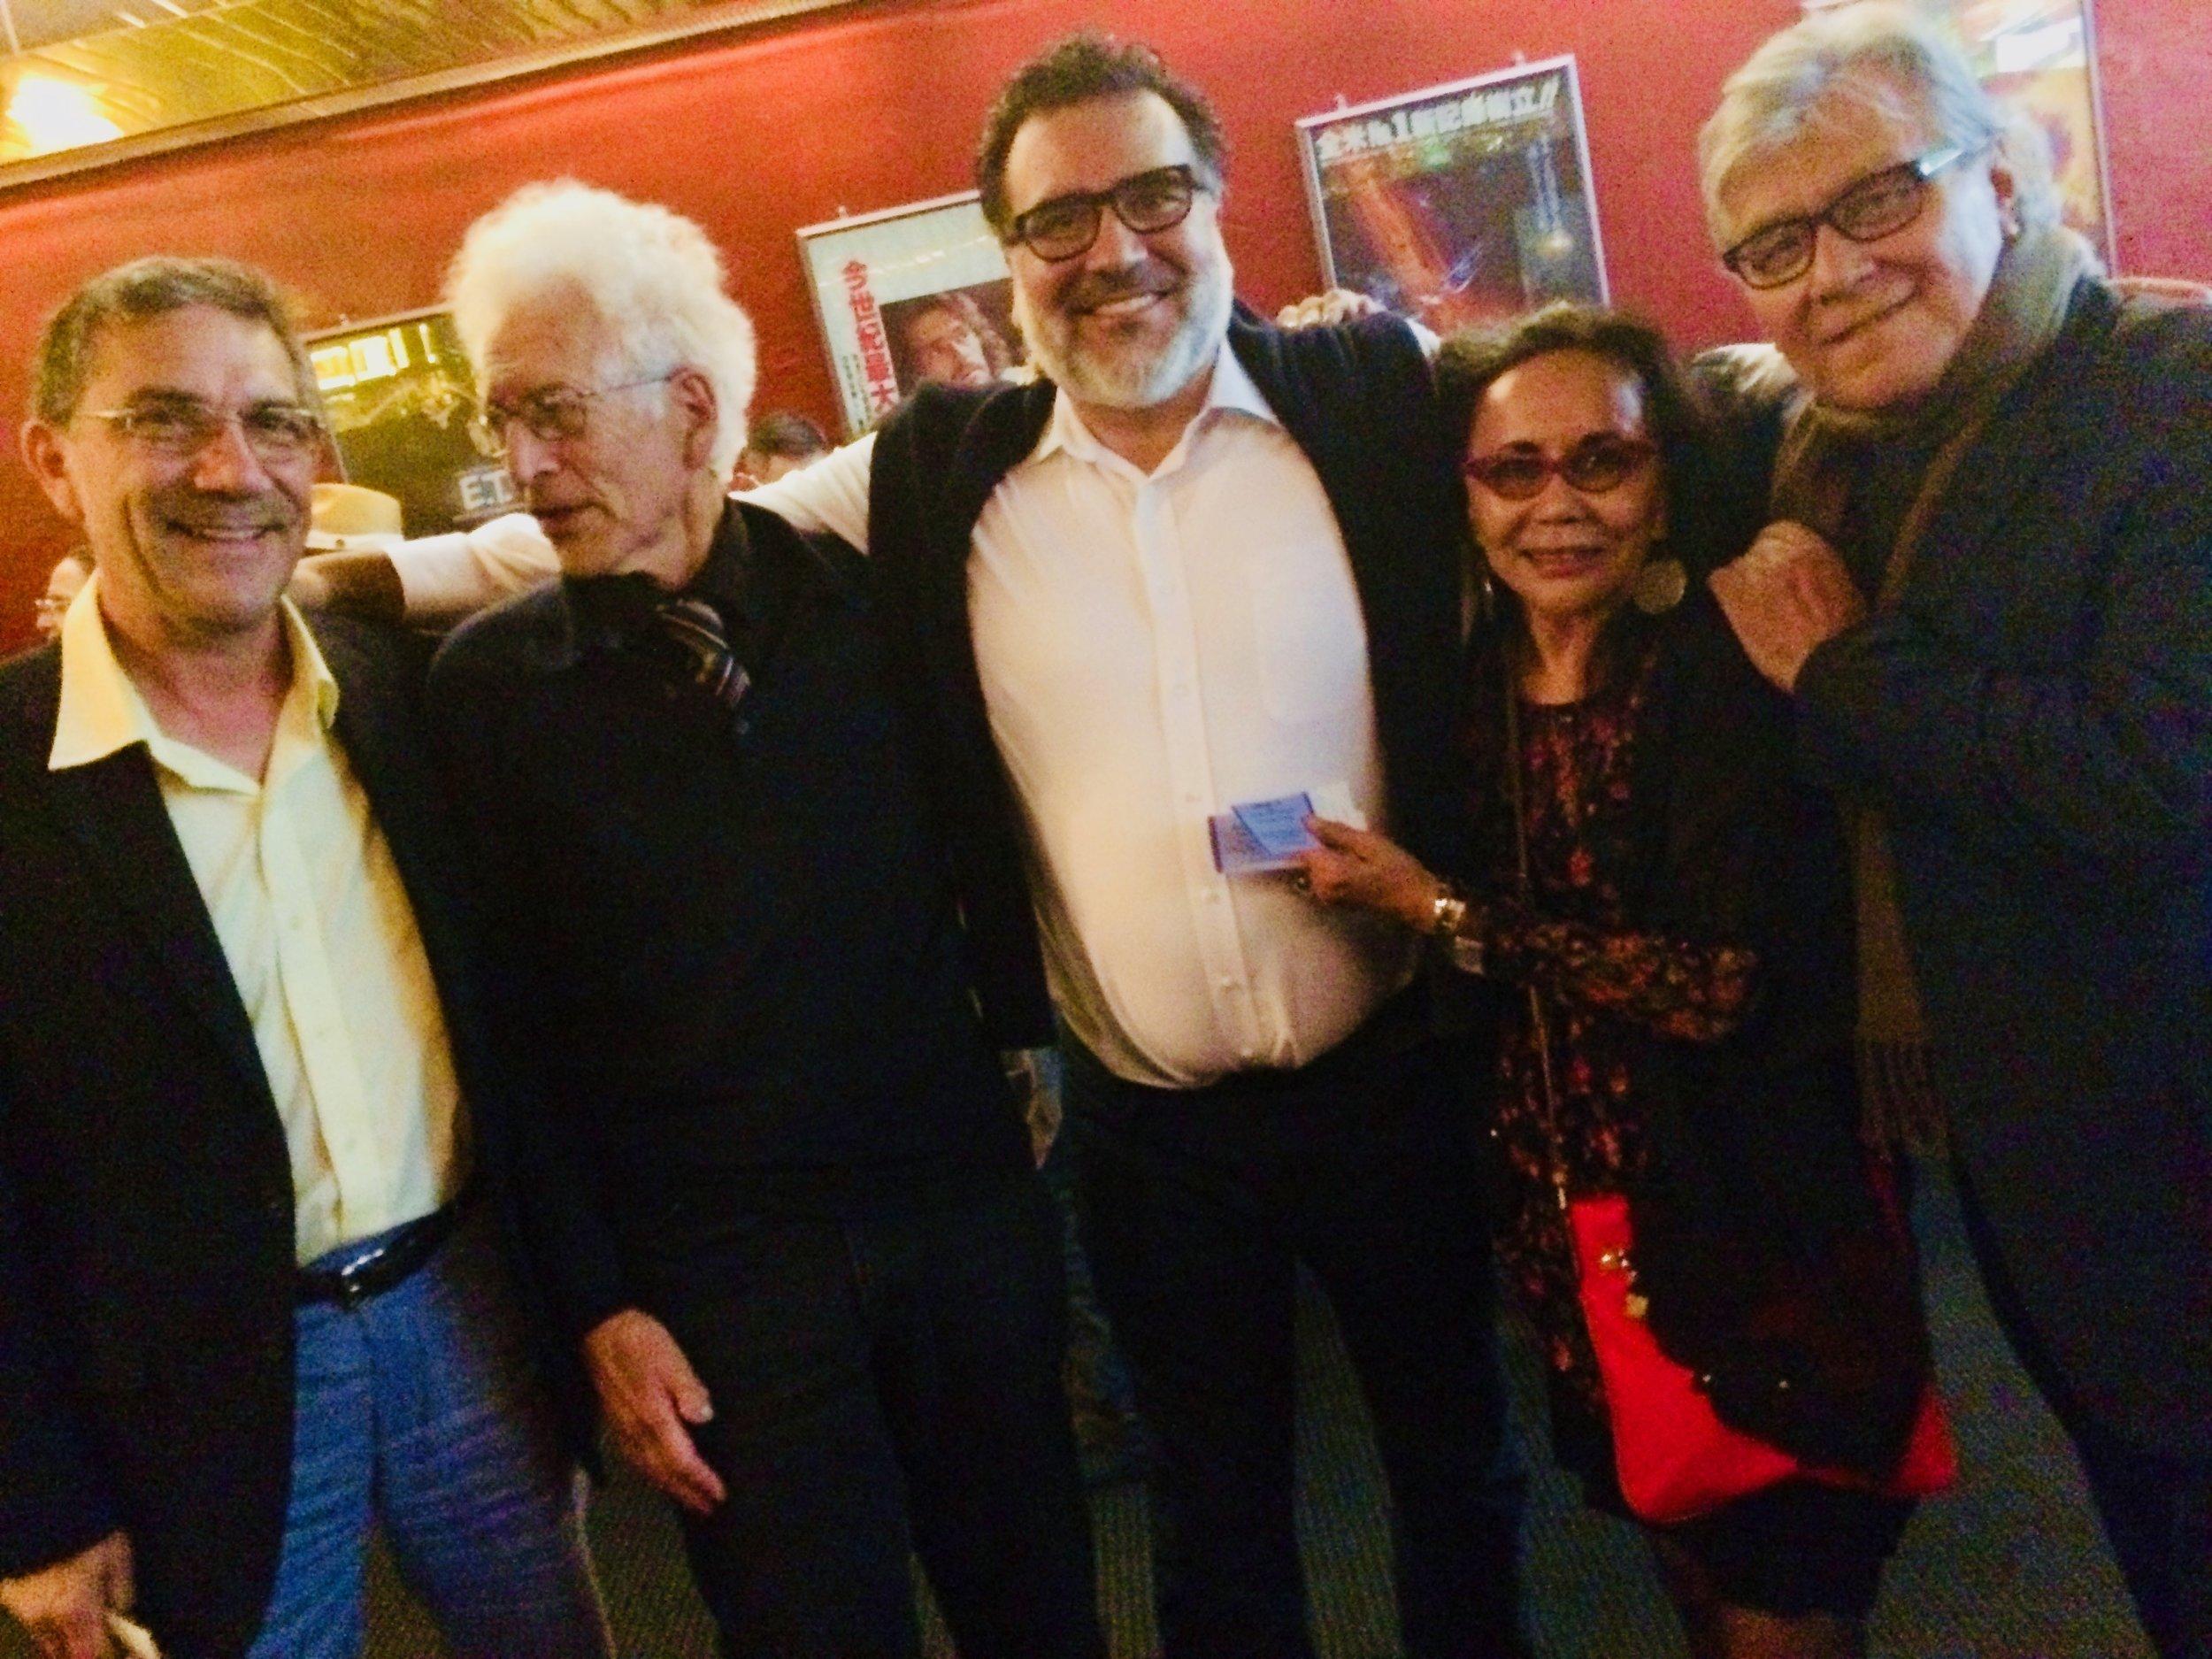 Marco Acosta, Alan Rinzler, Phillip Rodriguez, Anita Acosta and Ricardo Lopez at the San Francisco Latino Film Festival.